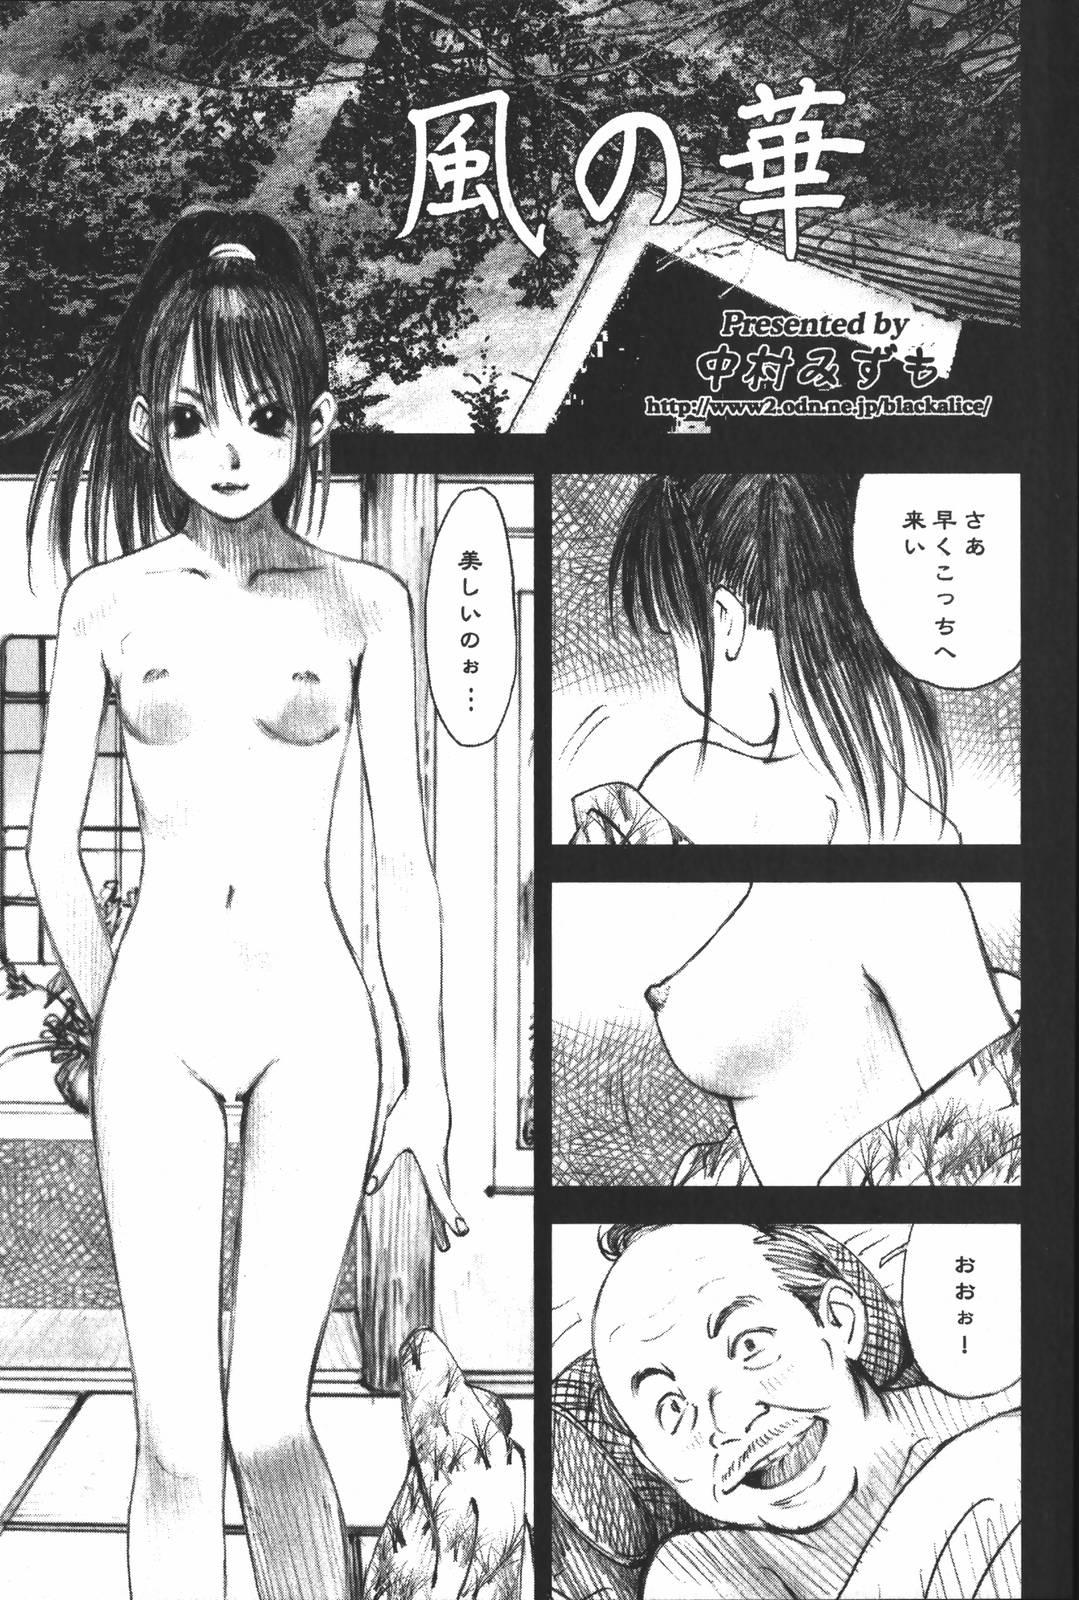 LOVE no You na Kimochi - The Feeling Like Love 70